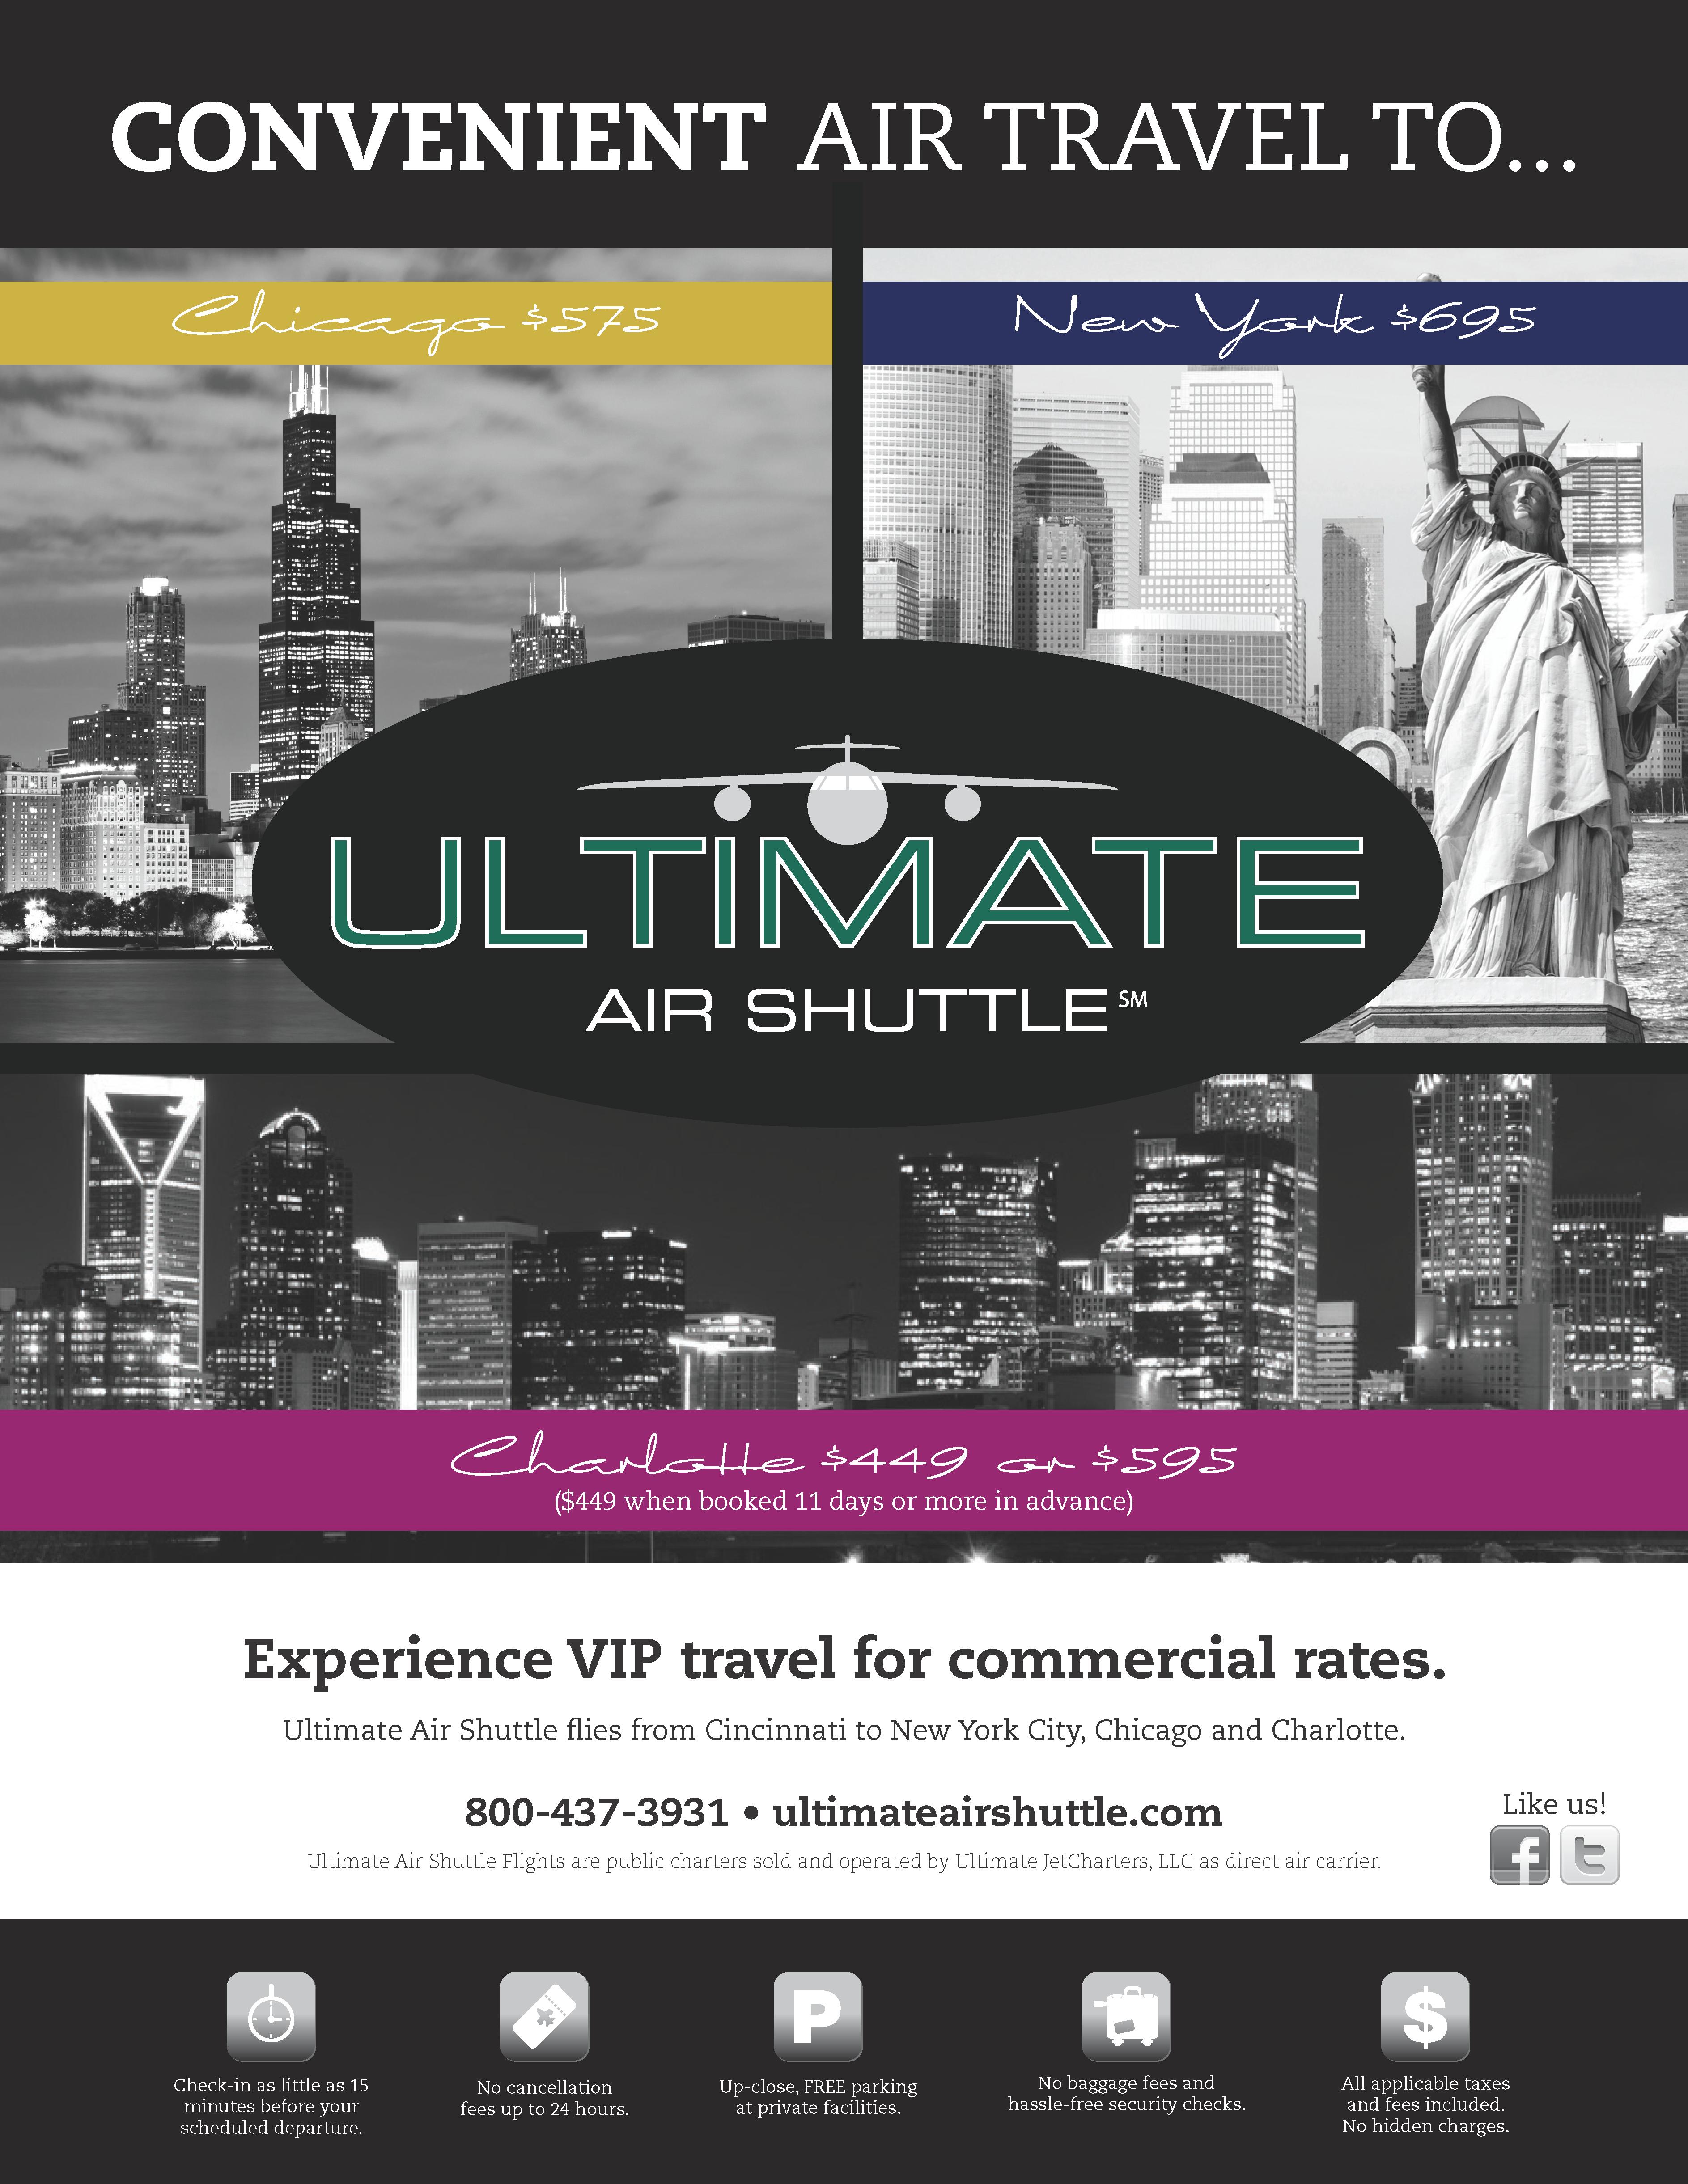 Ultimateairshuttle_1 png